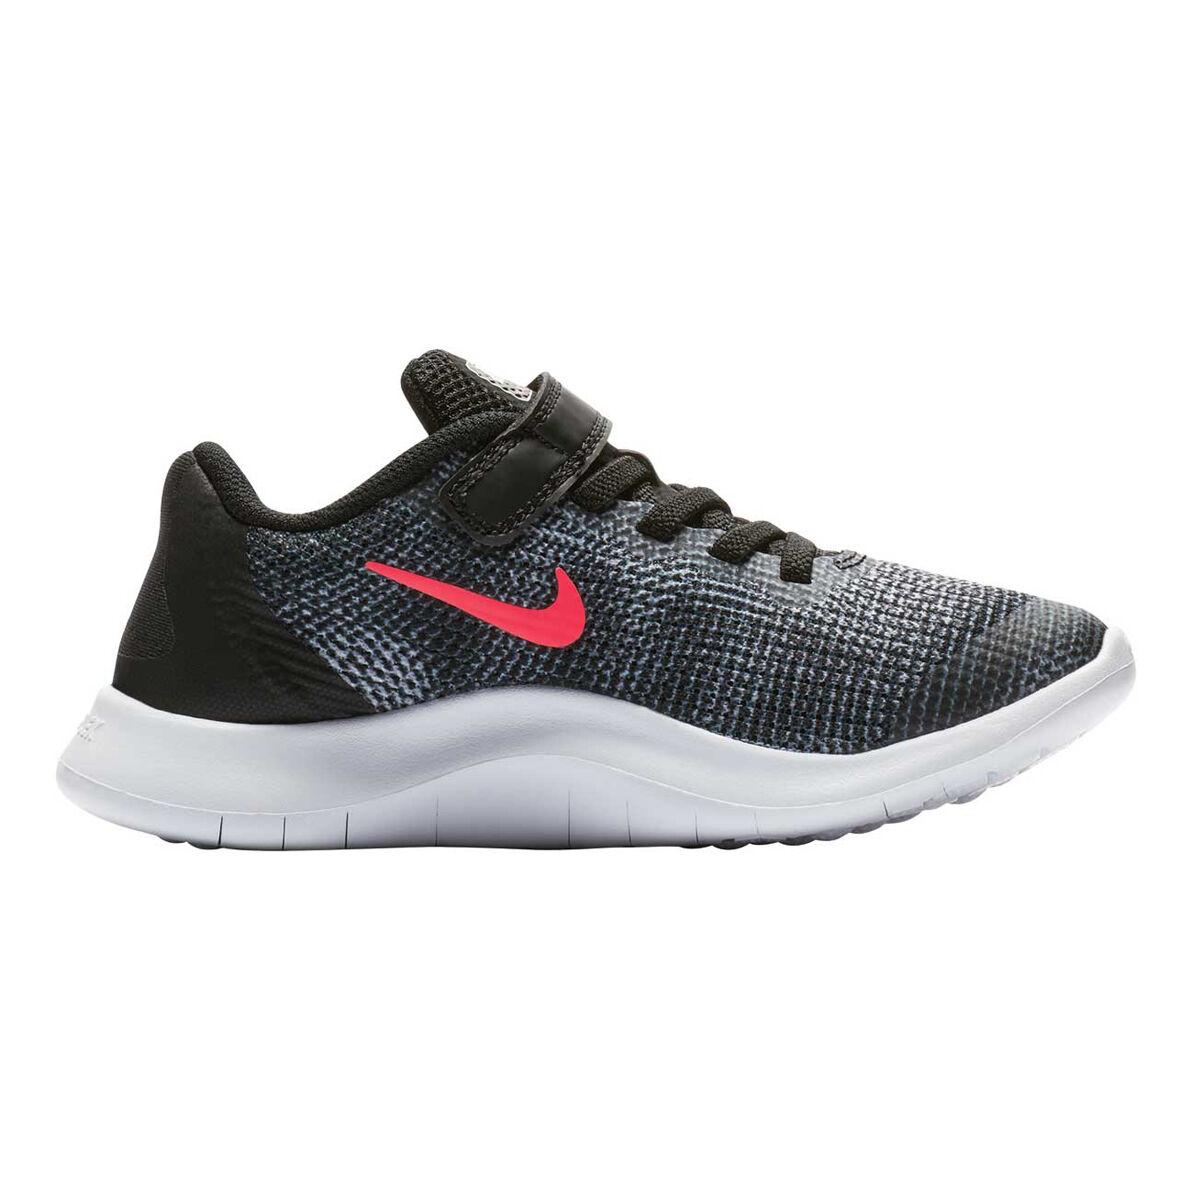 86819f2e138cc ... france nike flex rn 2018 junior girls running shoes black pink us 13  black 712fd 6bcbd hot nike free ...